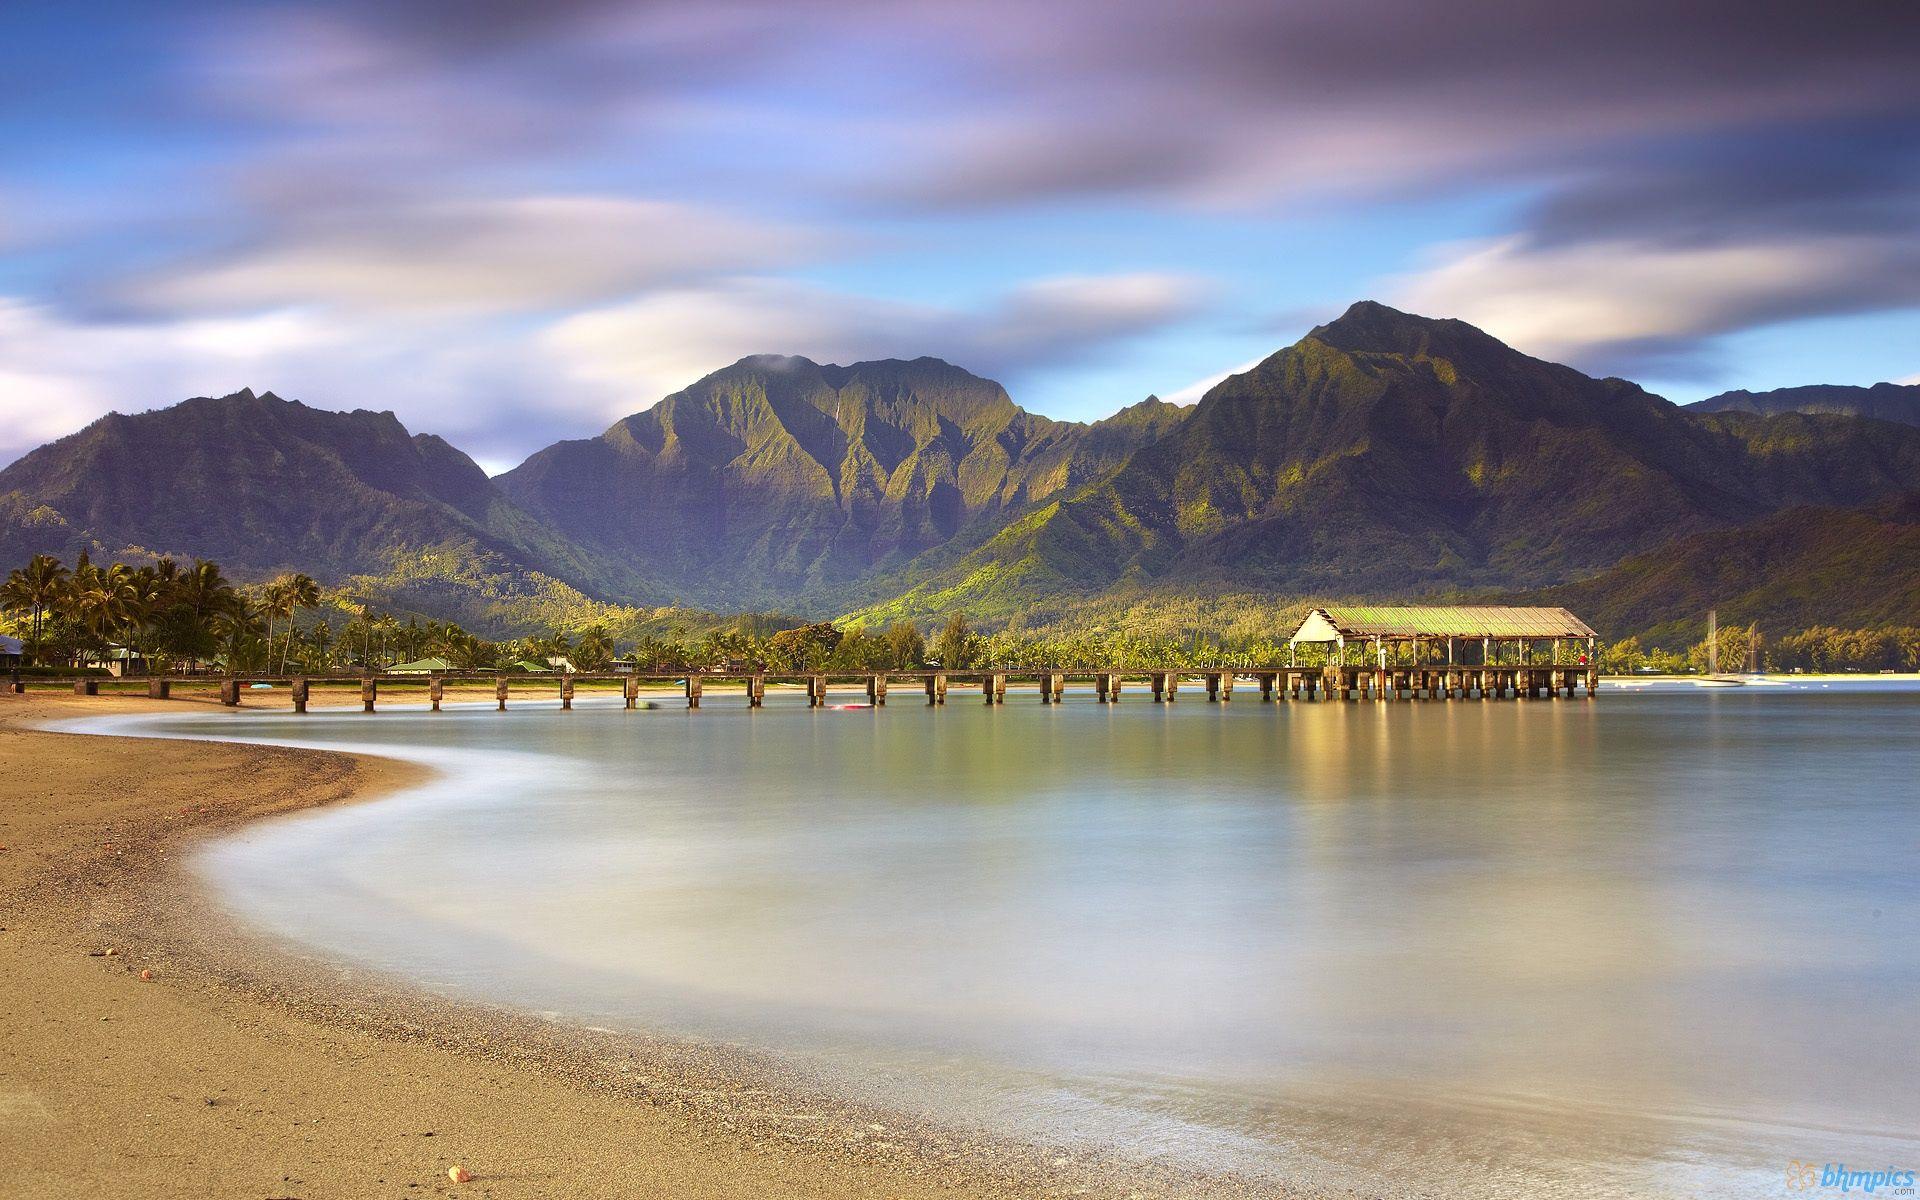 kauai wallpaper Kauai Beach Hanalei 1920 x 1200 Download 1920x1200